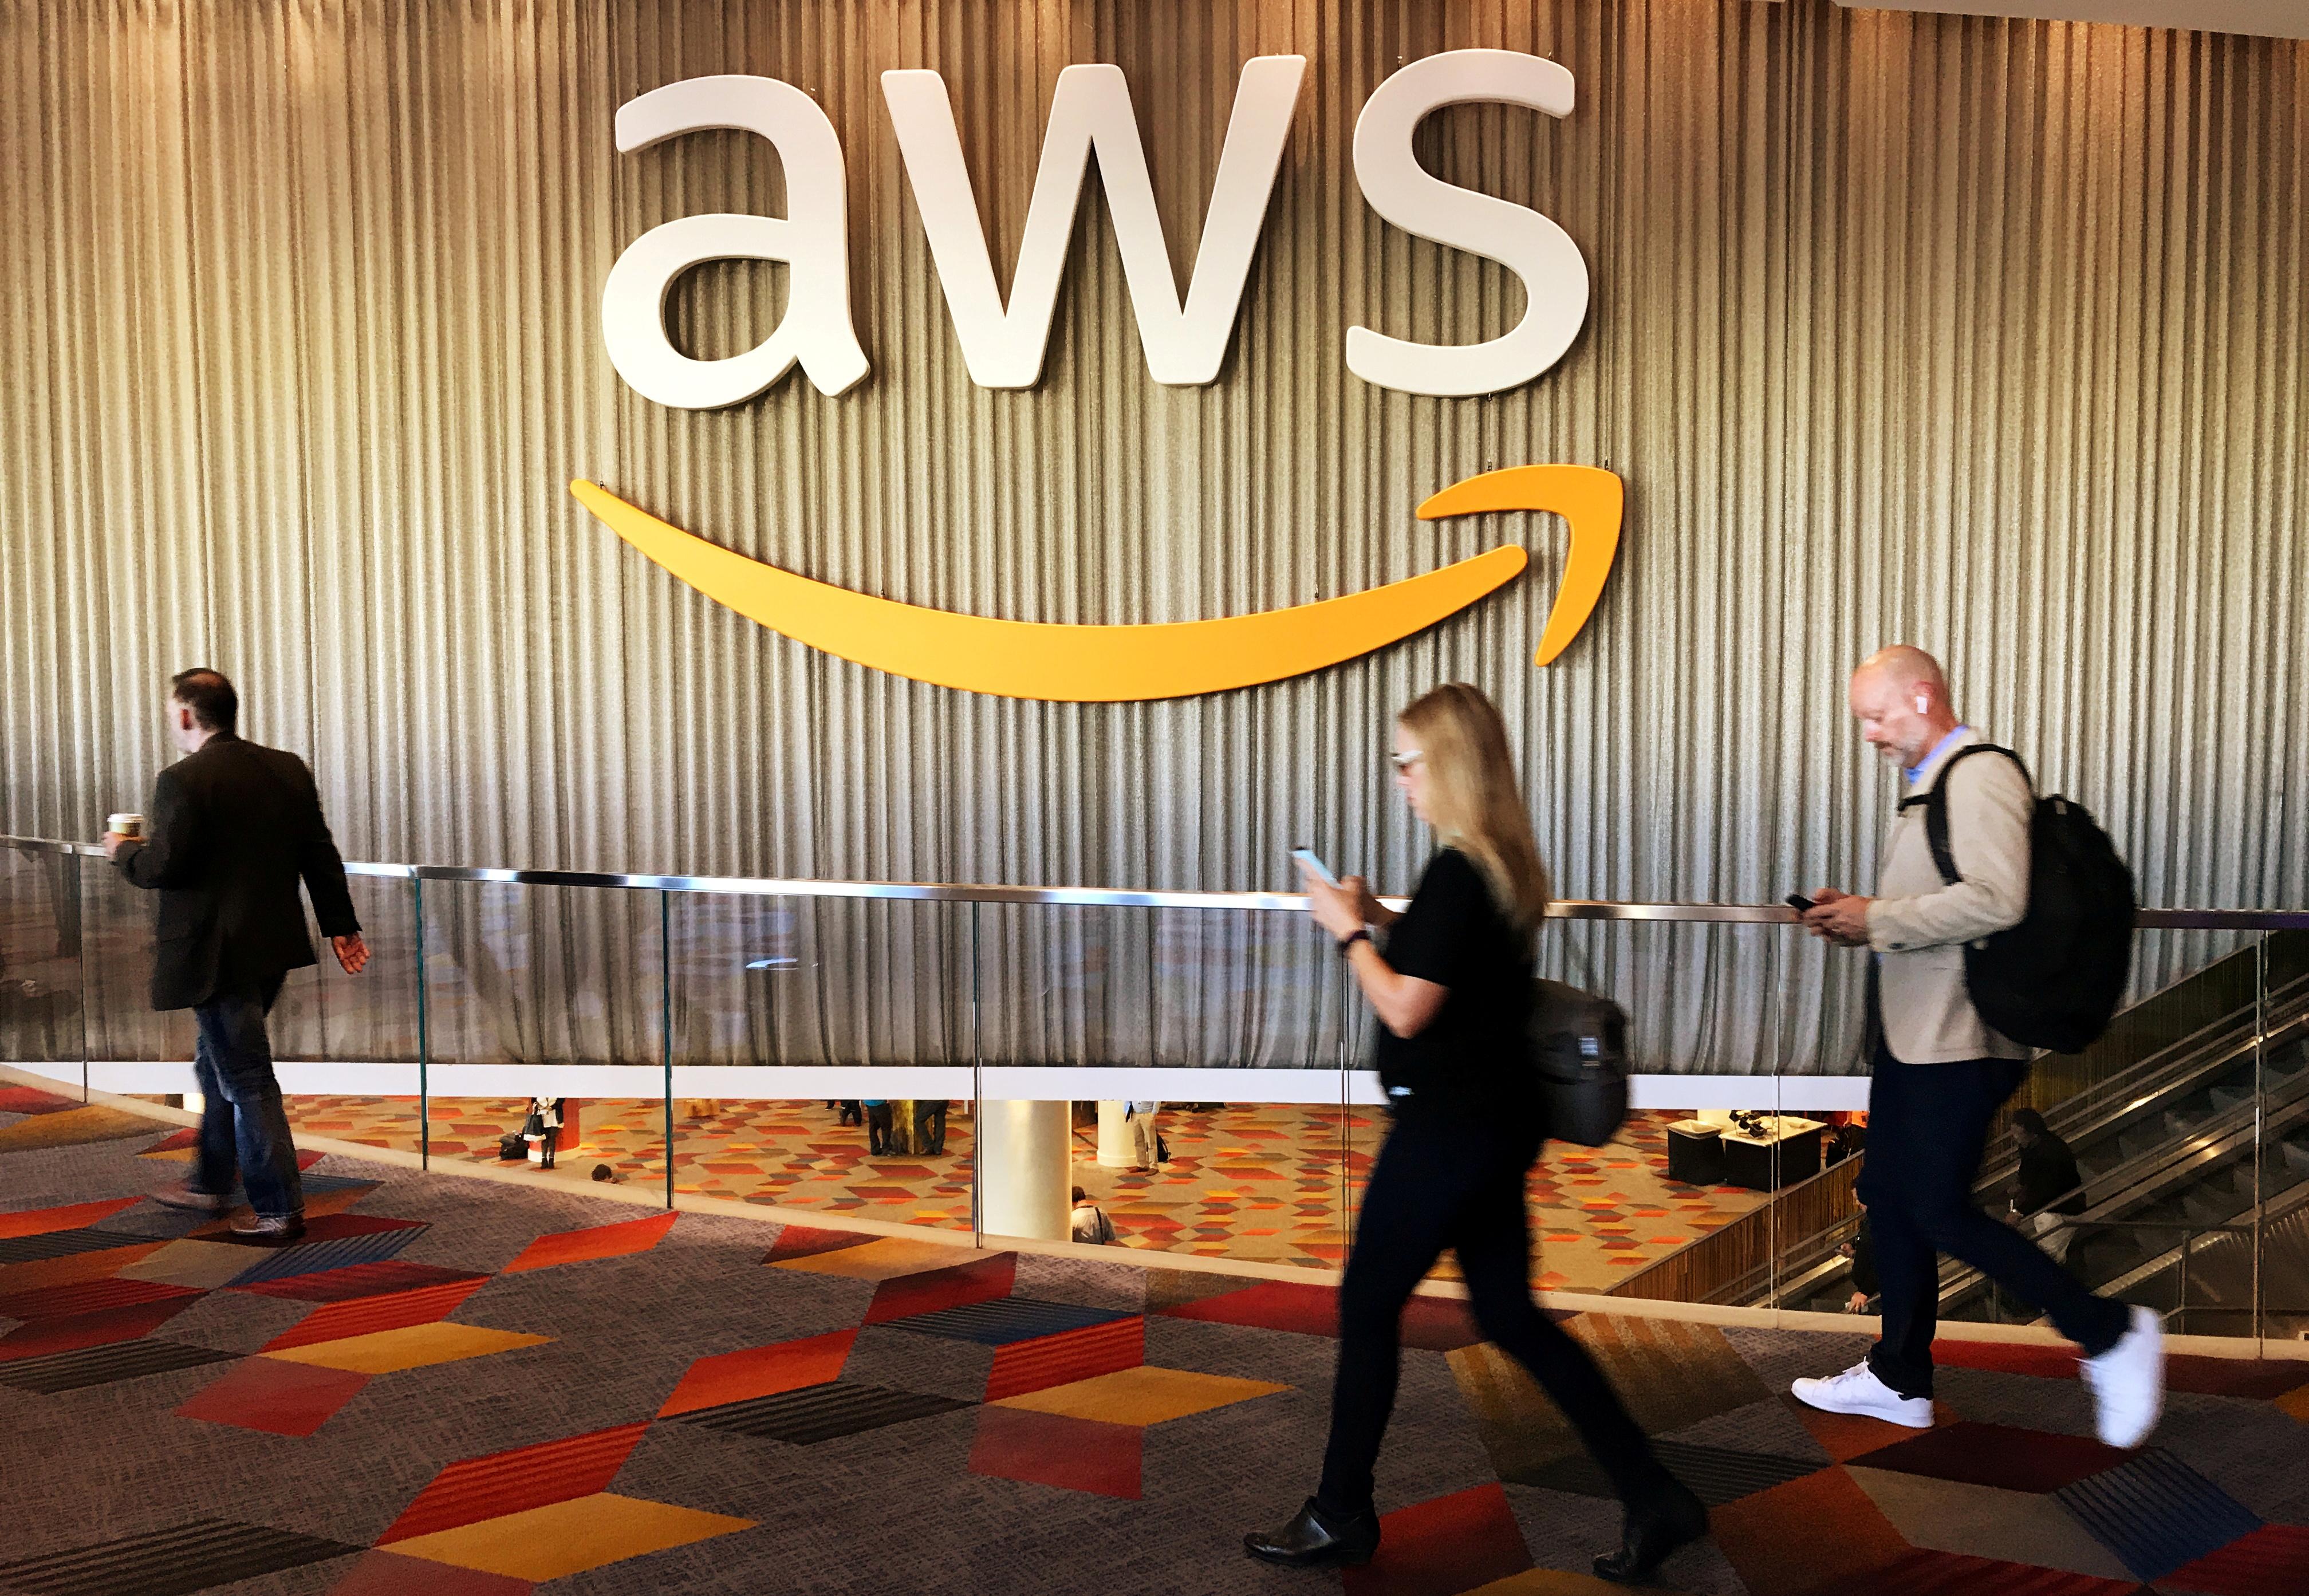 Attendees at Amazon.com Inc annual cloud computing conference walk past the Amazon Web Services logo in Las Vegas, Nevada, U.S., November 30, 2017. REUTERS/Salvador Rodriguez